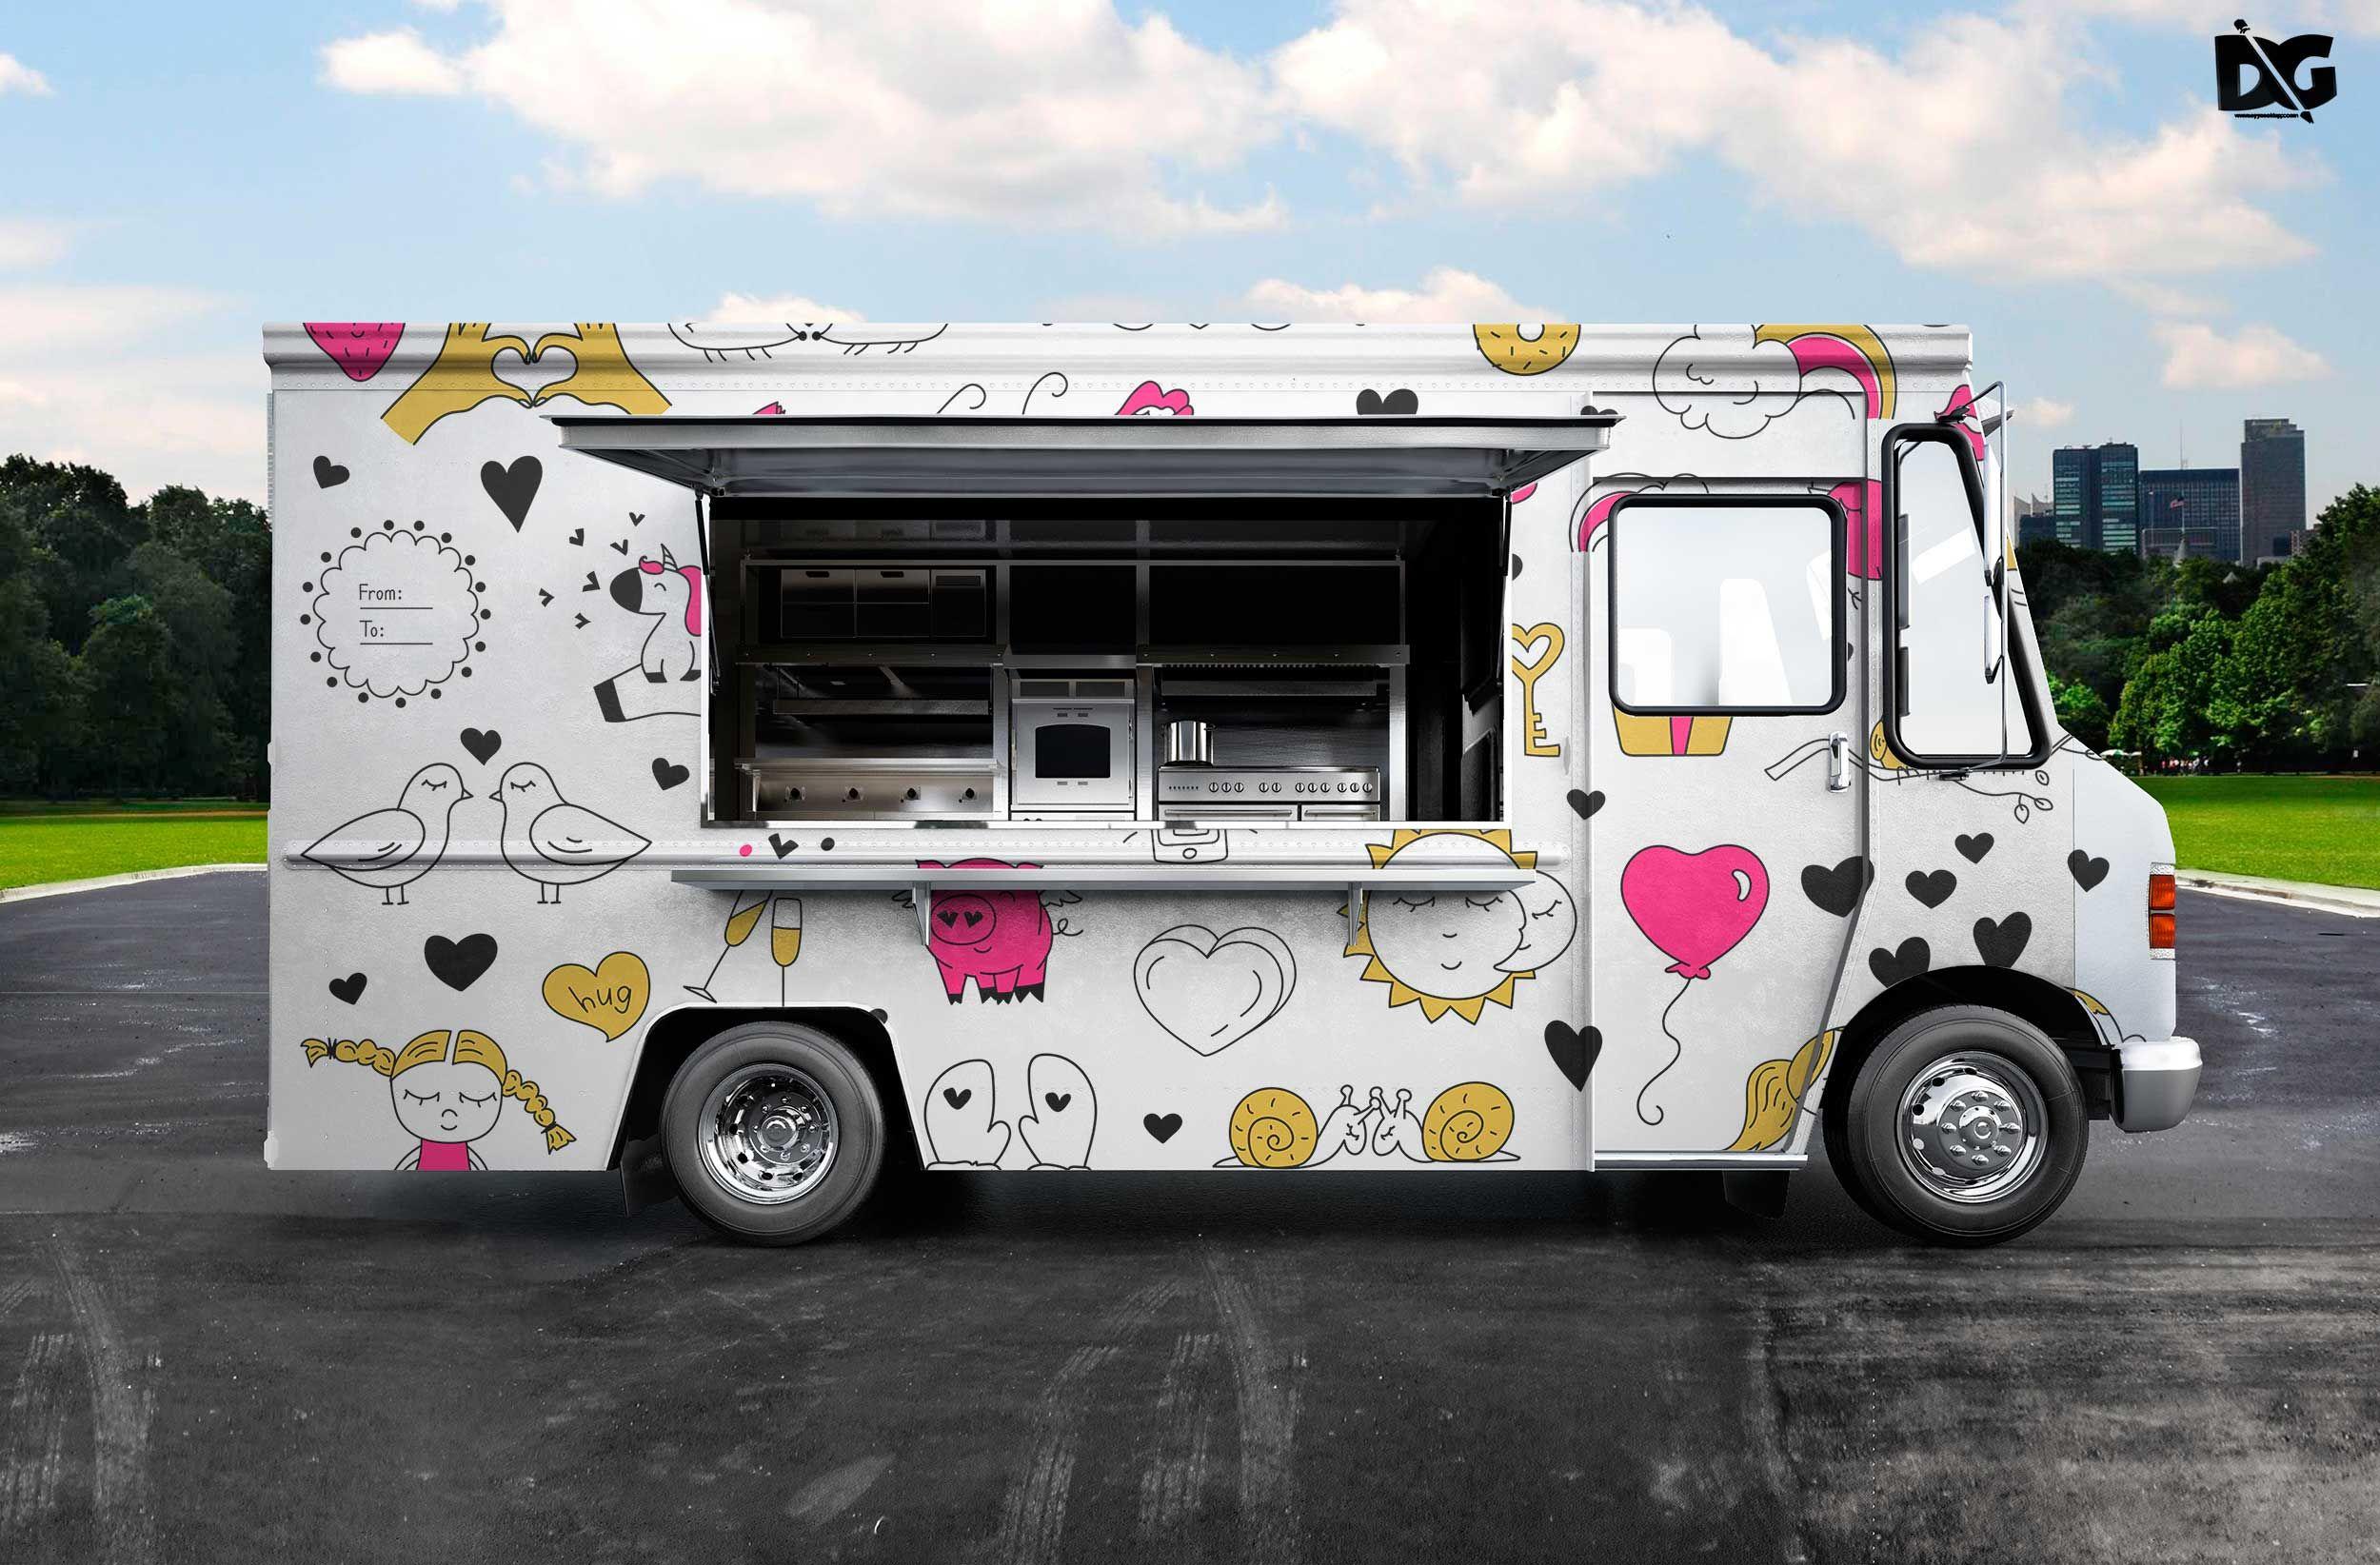 Psd Burger Food Truck Design Mockup Truck Design Food Truck Design Food Truck